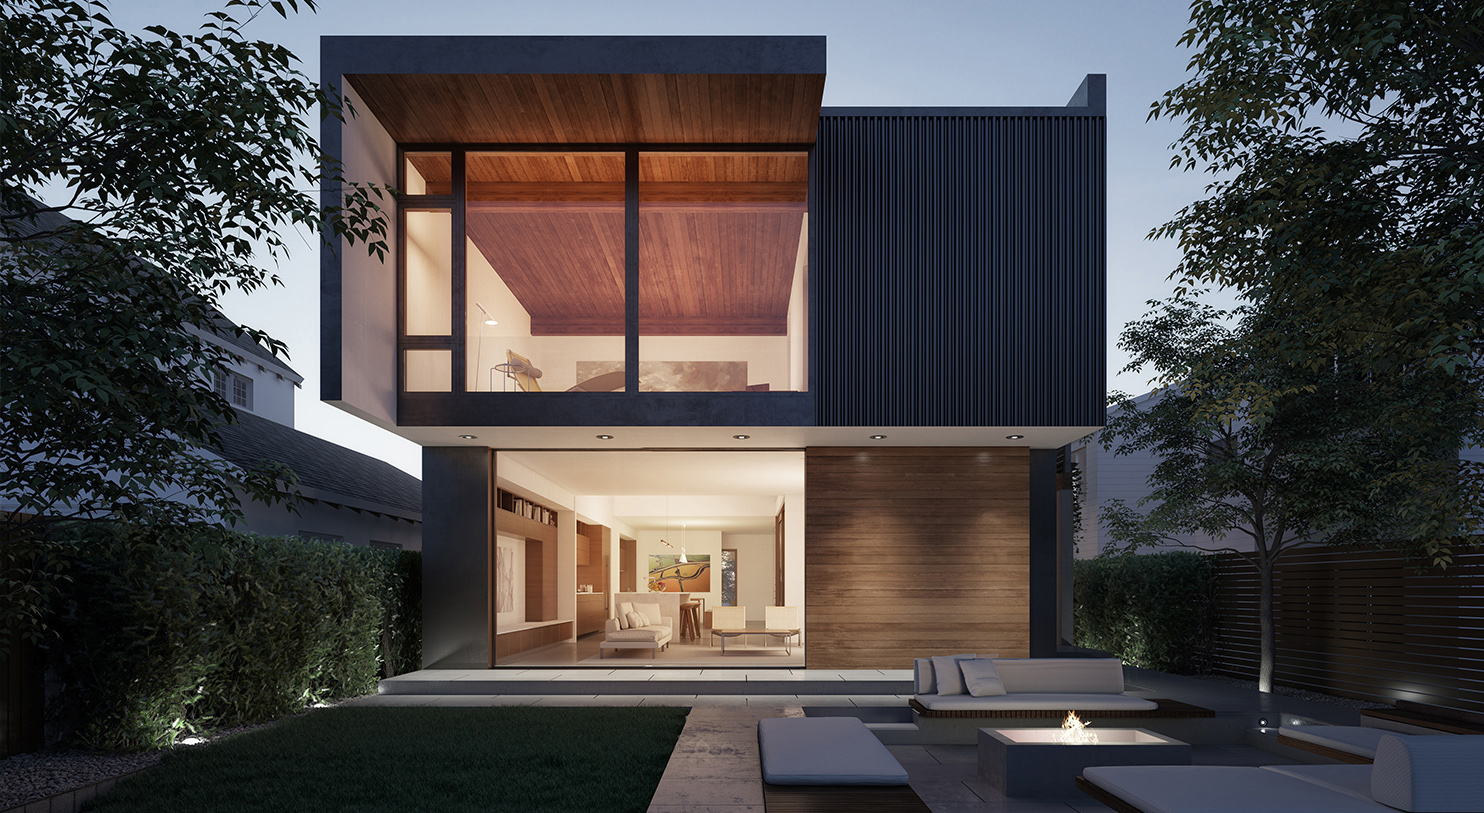 turkel_design_modern_prefab_home_axiom_series_rendering_axiom2610_exterior.jpg